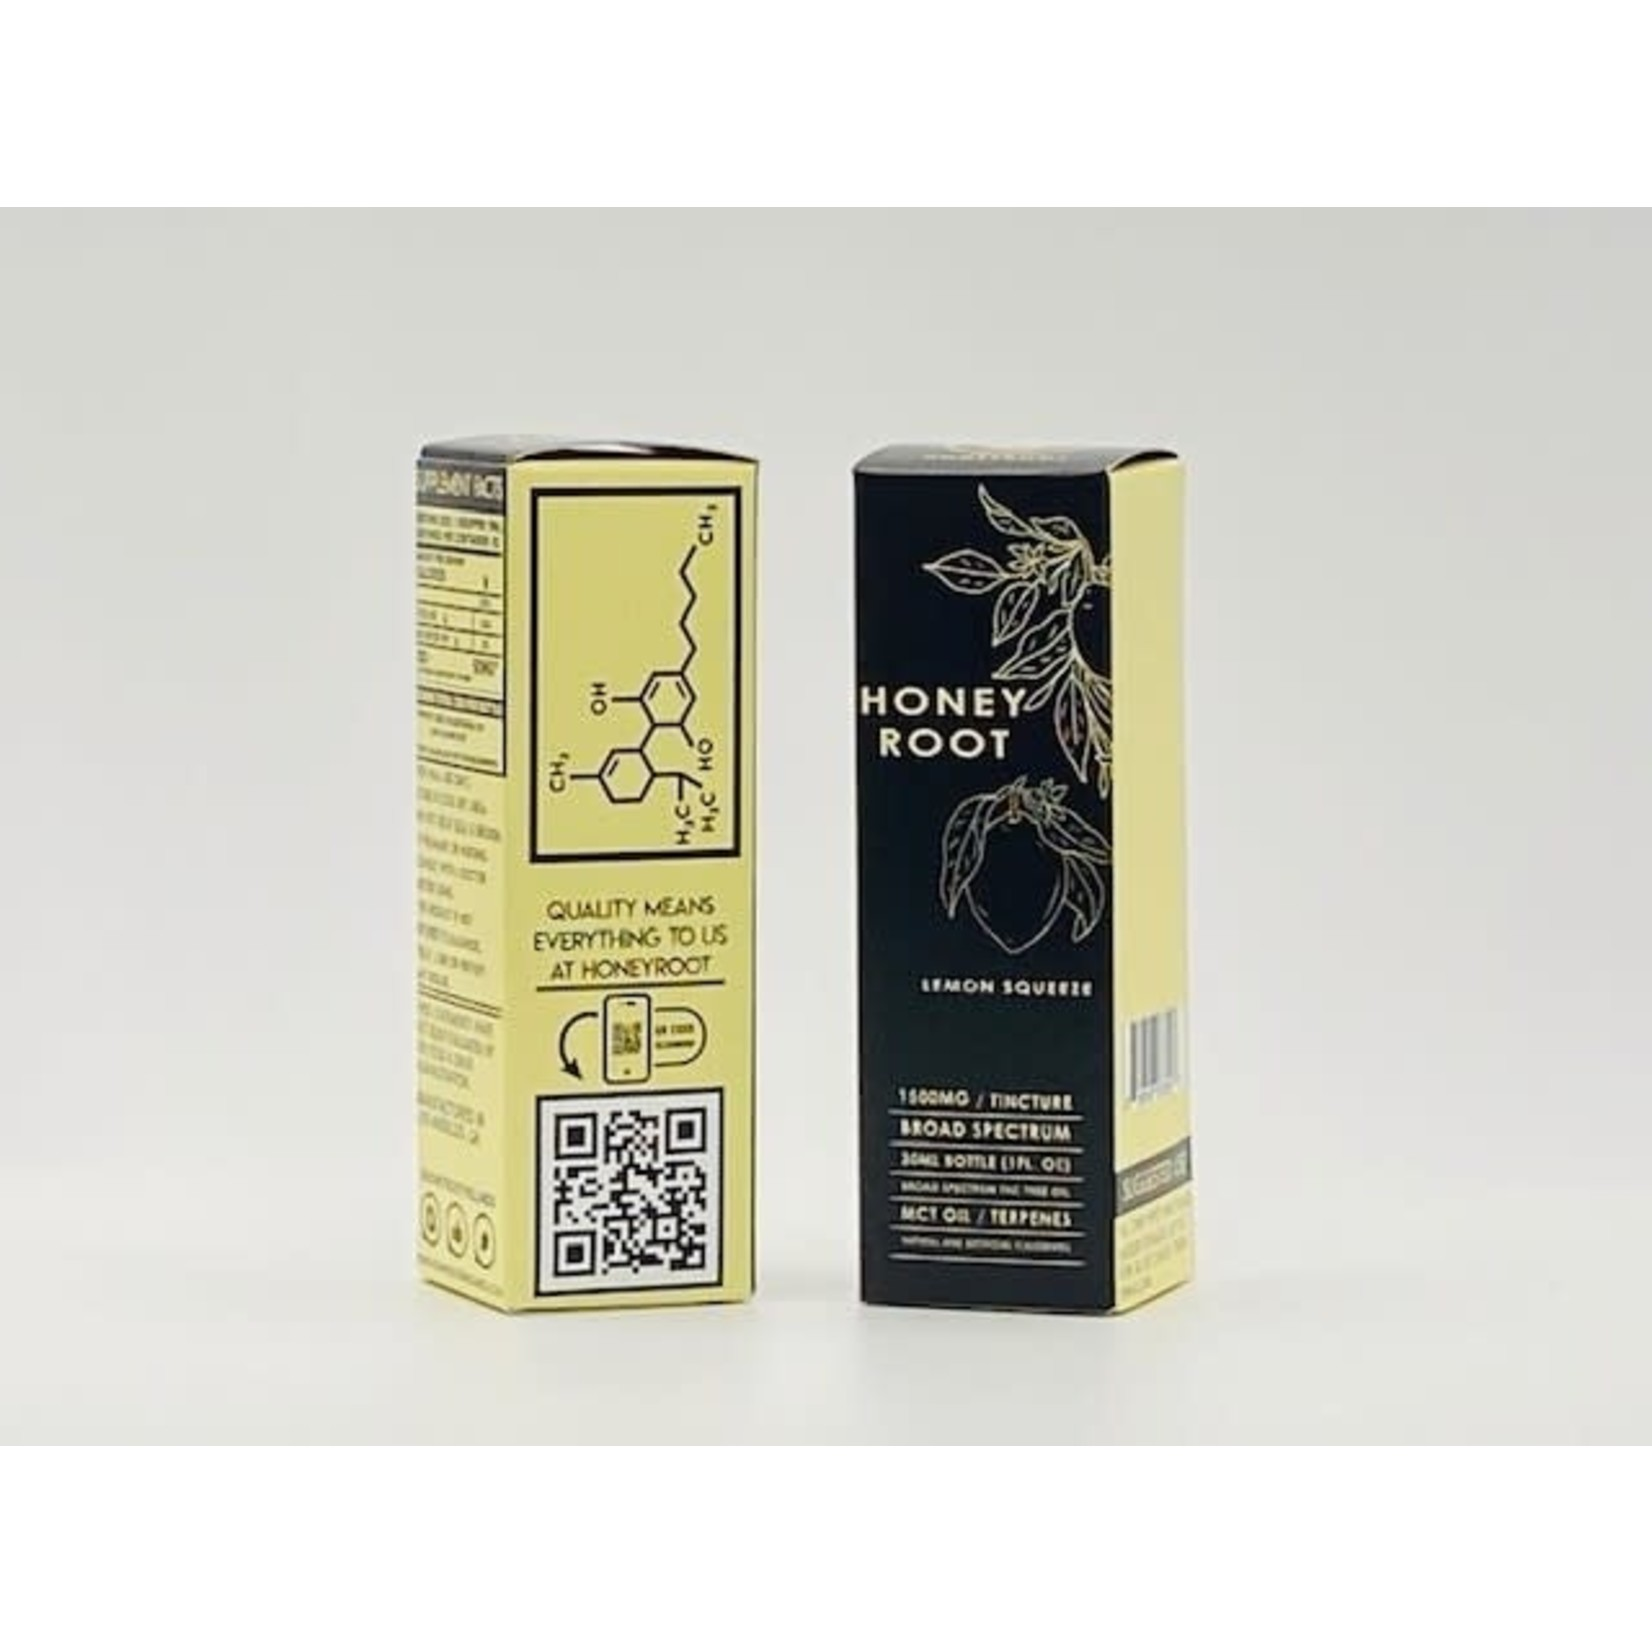 Honey Root Honey Root CBD Lemon Squeeze Tincture